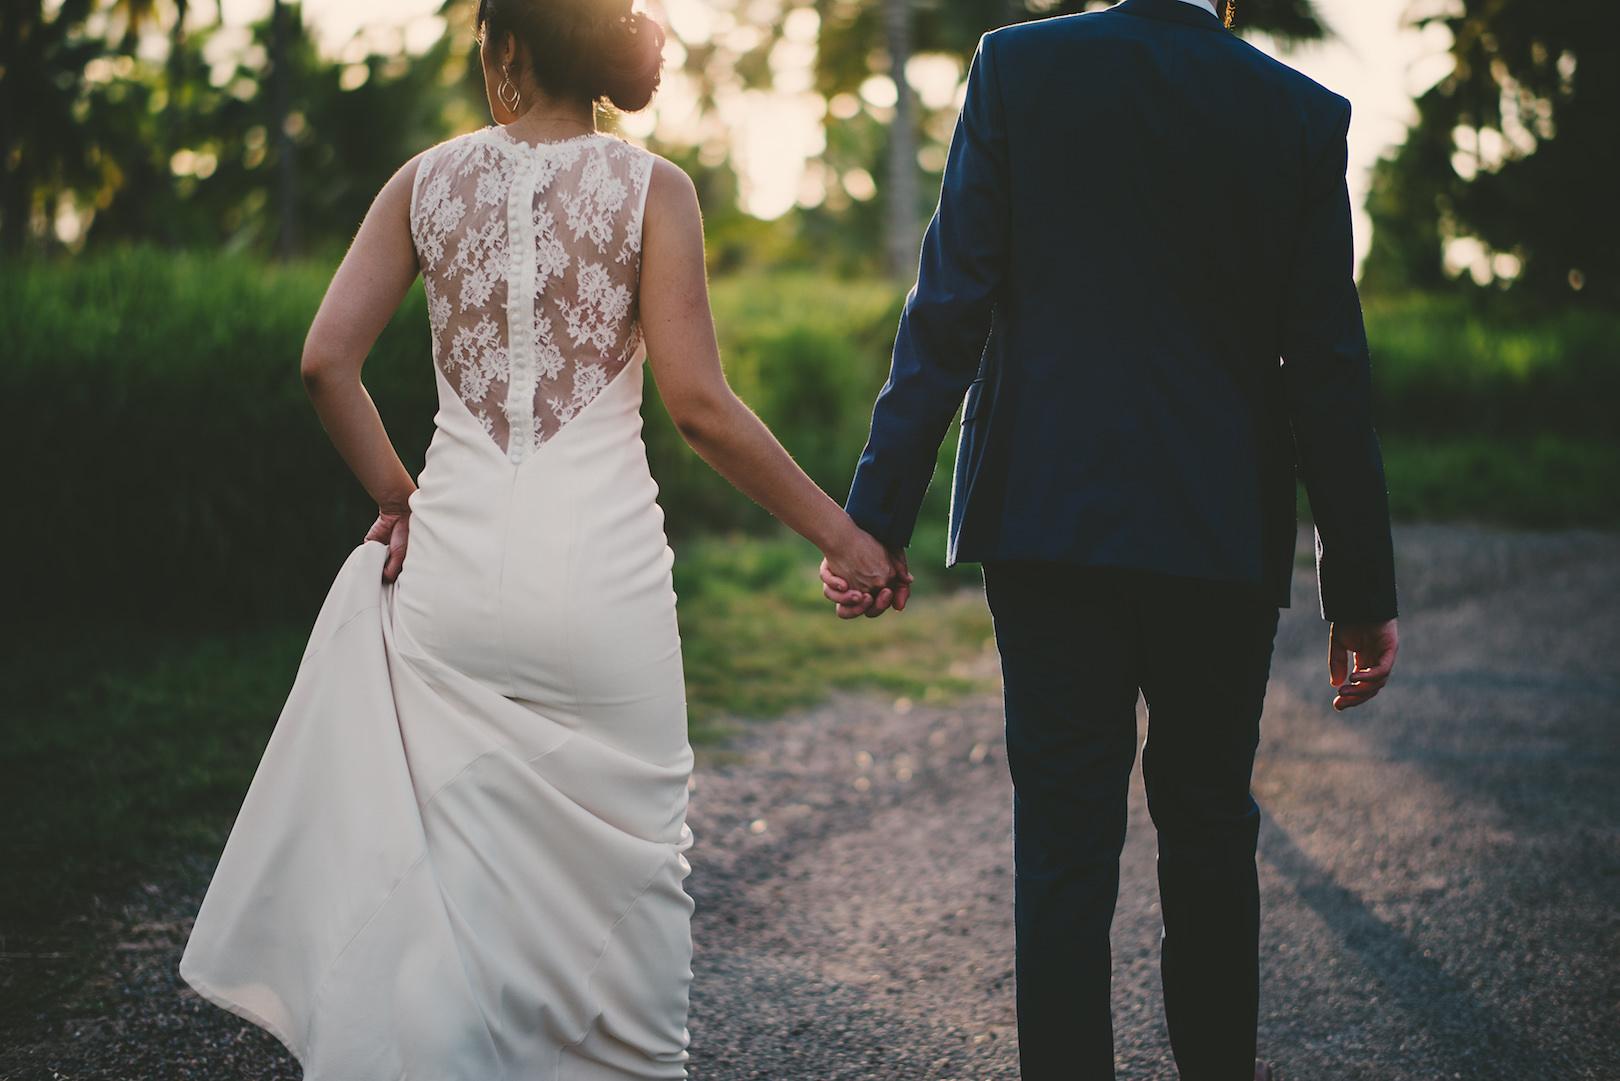 Nathan & Felicia - Wedding Day - © Dallas Kolotylo Photography - 498